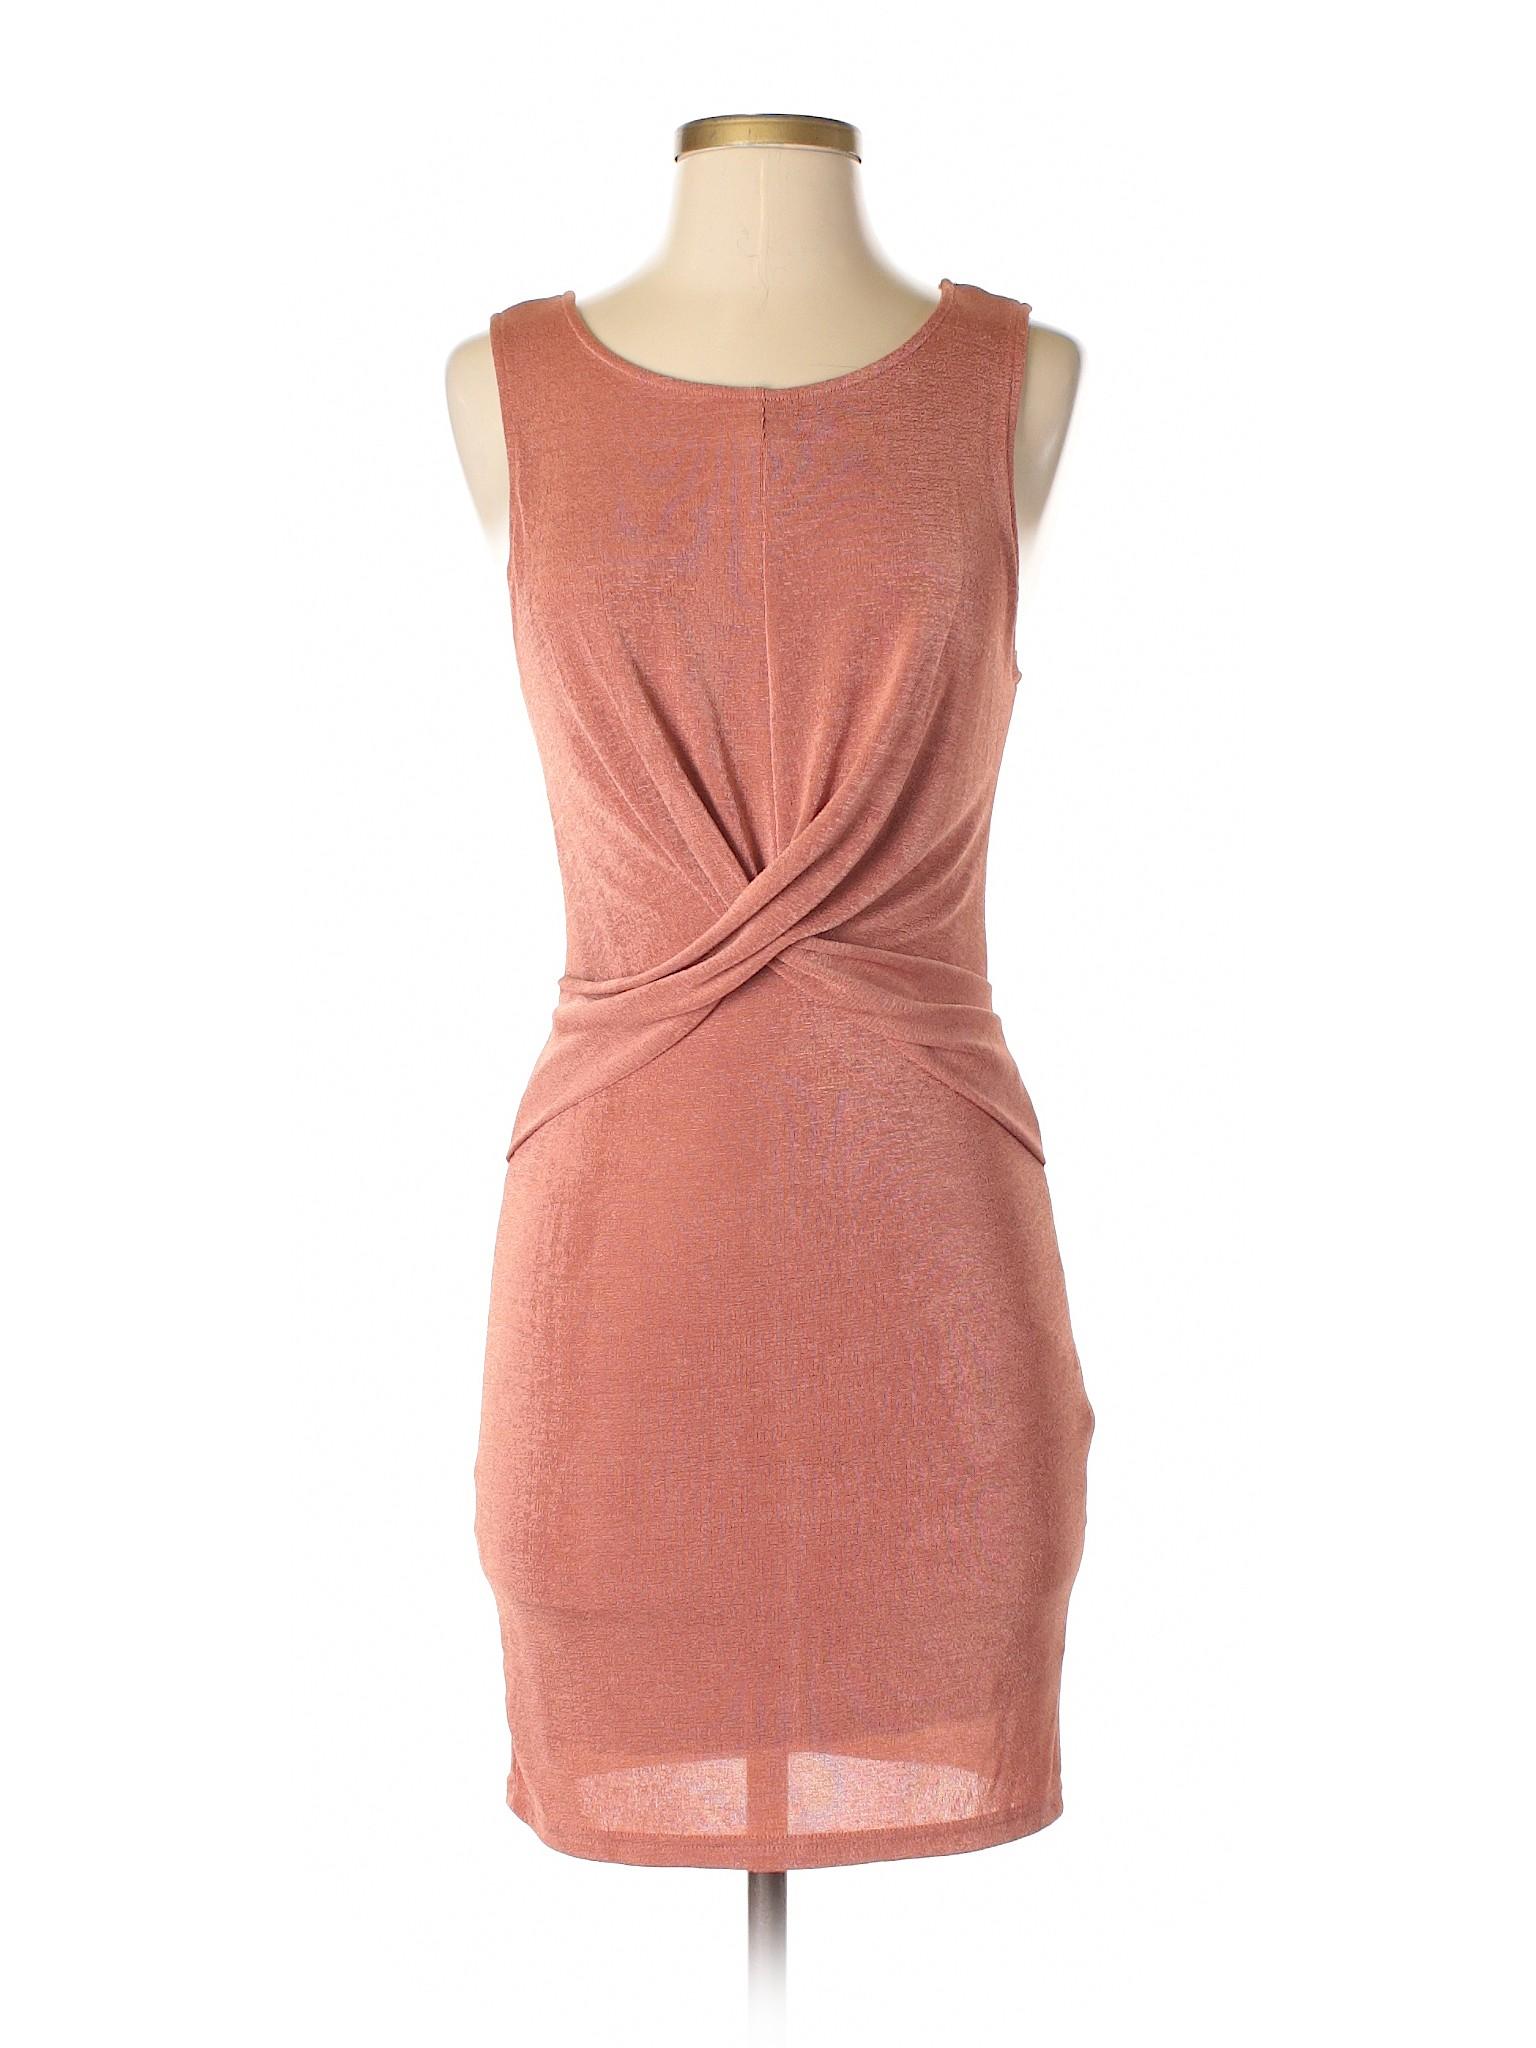 Selling Dress Pink Mink Casual Dress Selling Pink Selling Mink Casual Pink Mink Casual Mink Selling Dress rAwrZnSOq